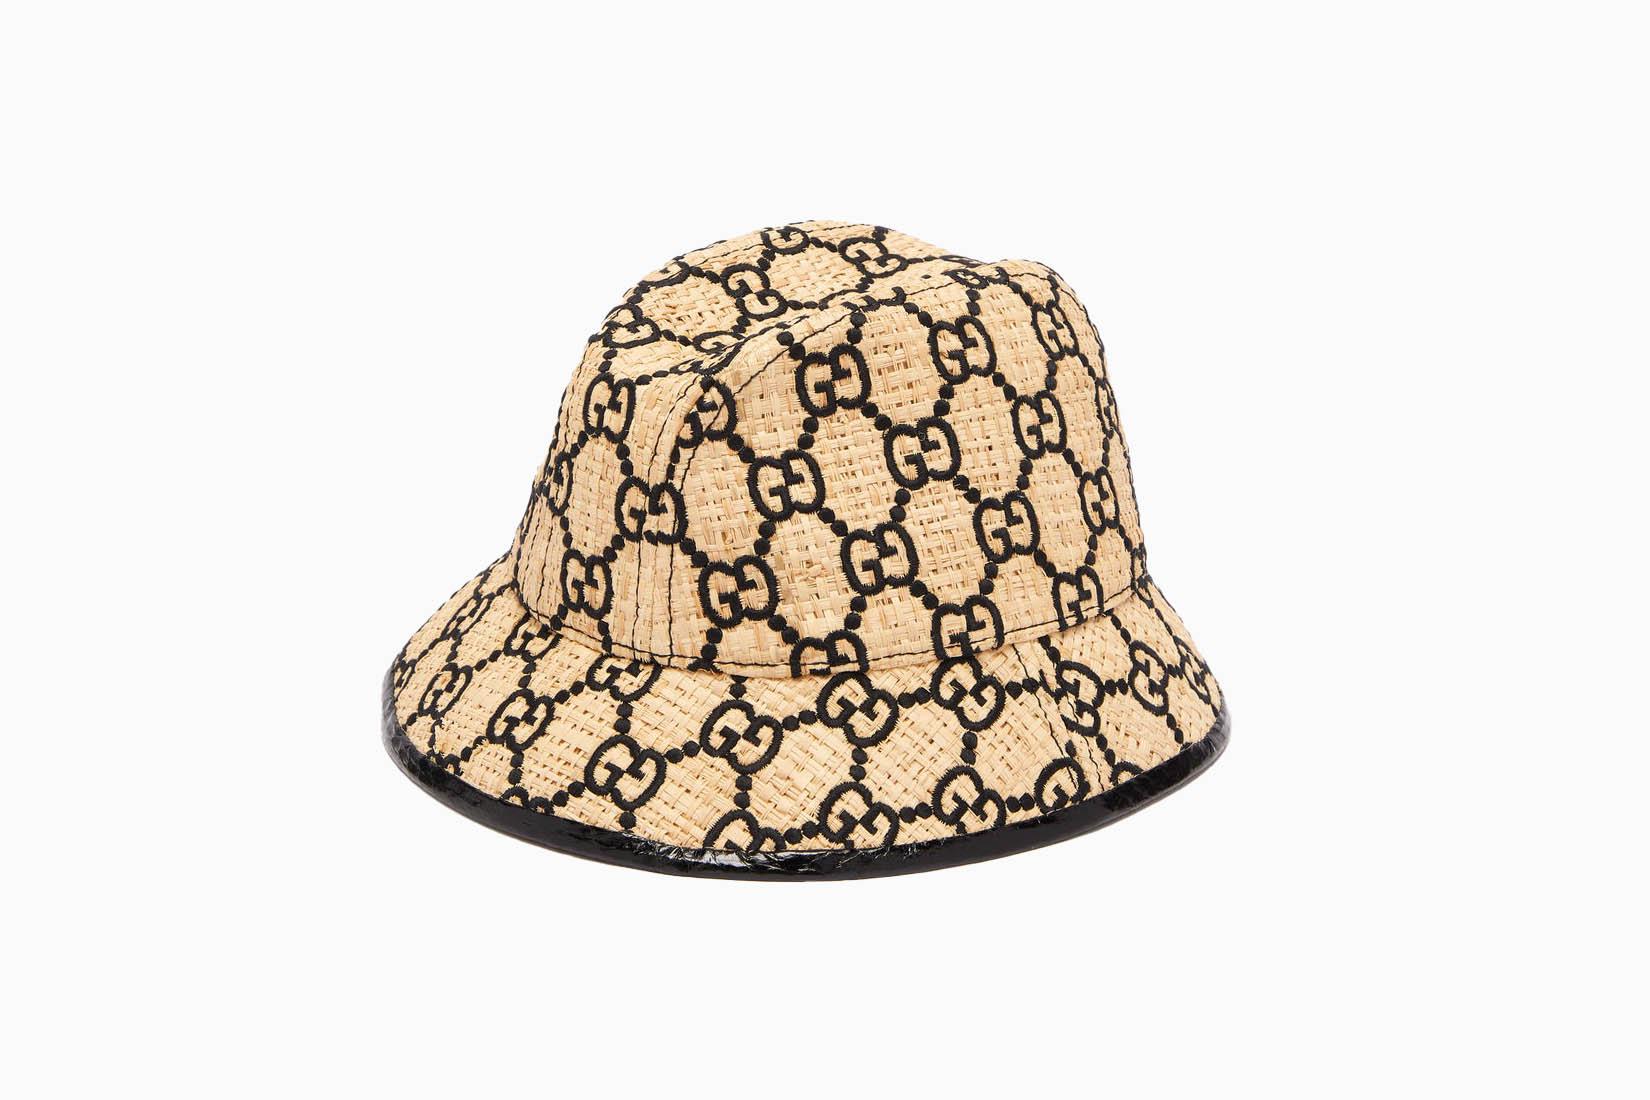 best sun hats women review gucci straw bucket Luxe Digital